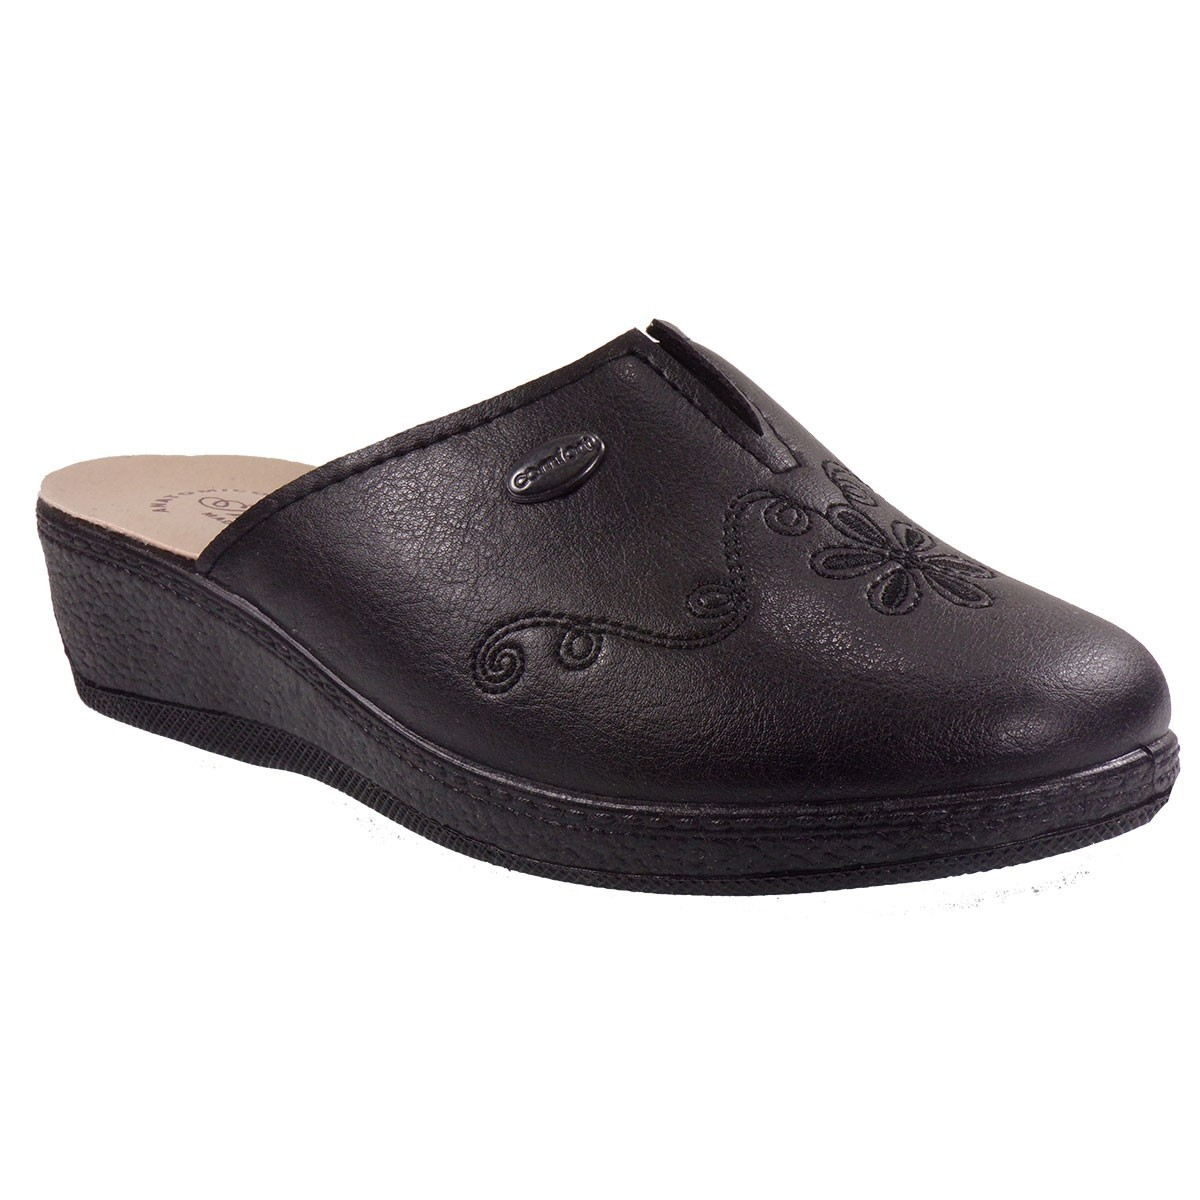 Bagiota Shoes Γυναικείες Παντόφλες annarita-1622 Μαύρο